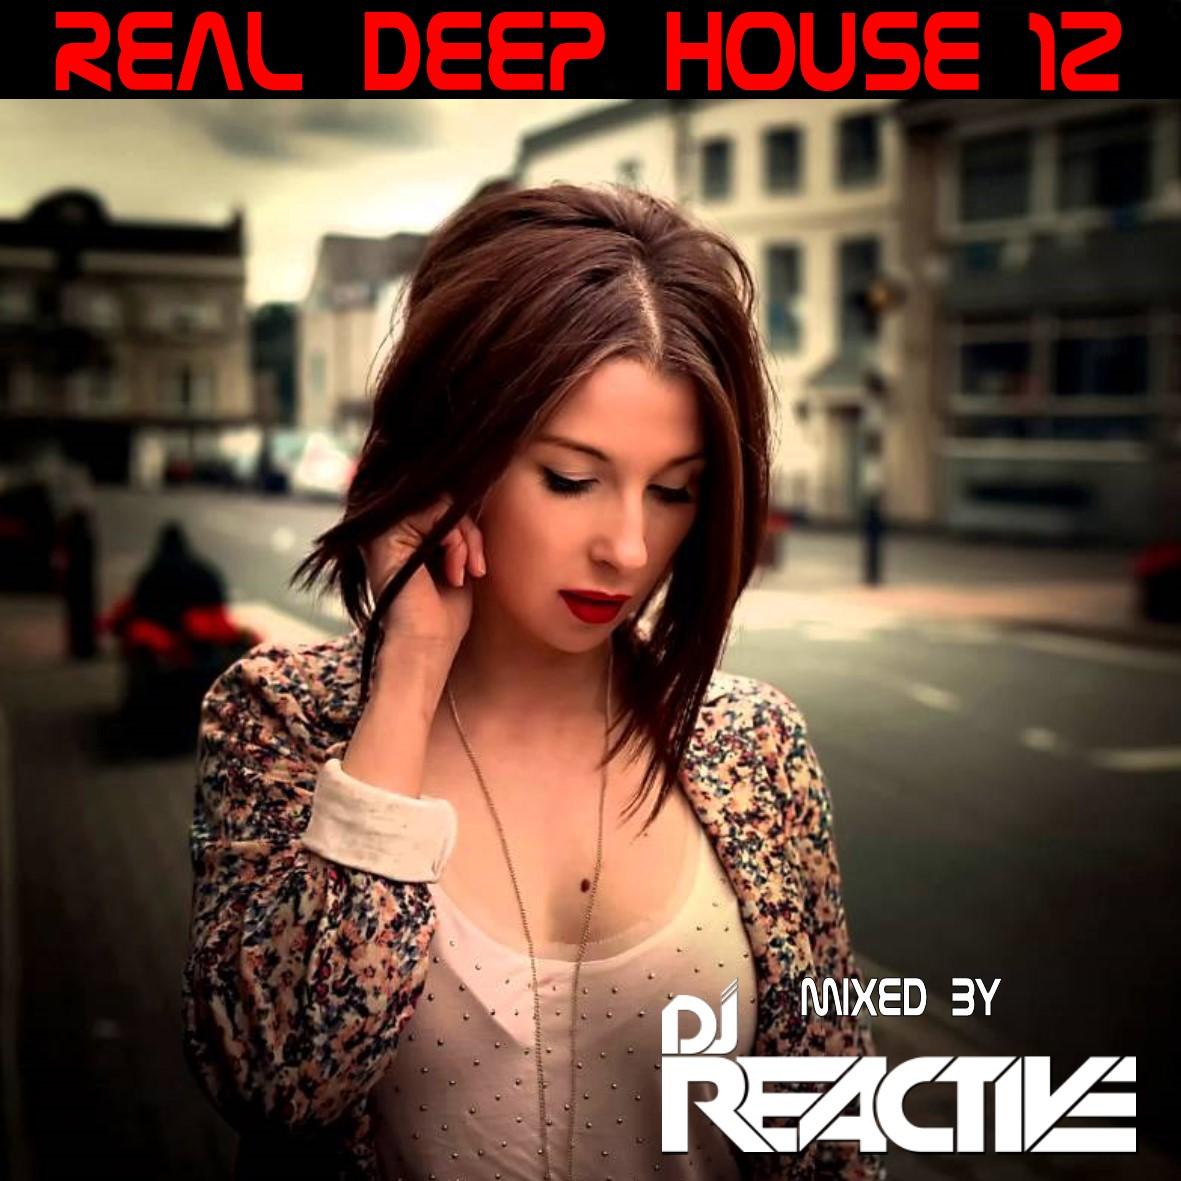 Dj Reactive - Real Deep House Volume 12 ()